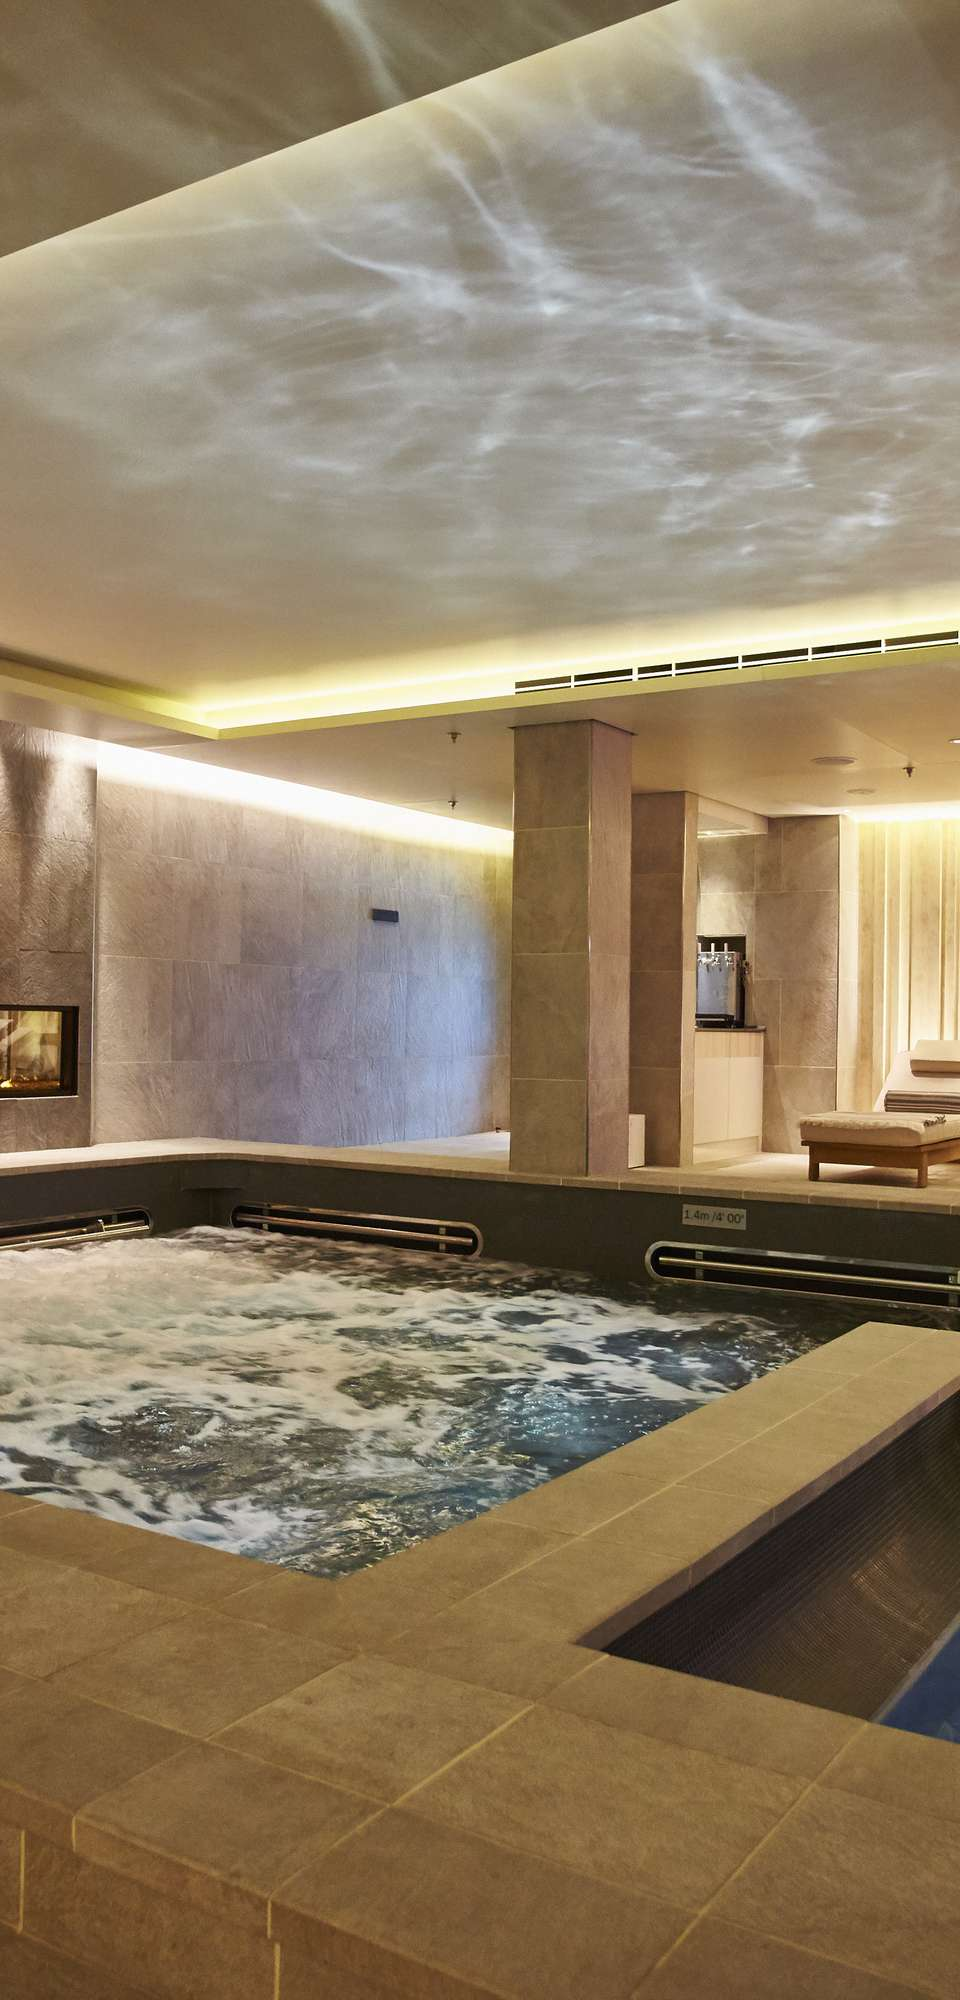 Viking Star thermal suite in the LivNordic Spa